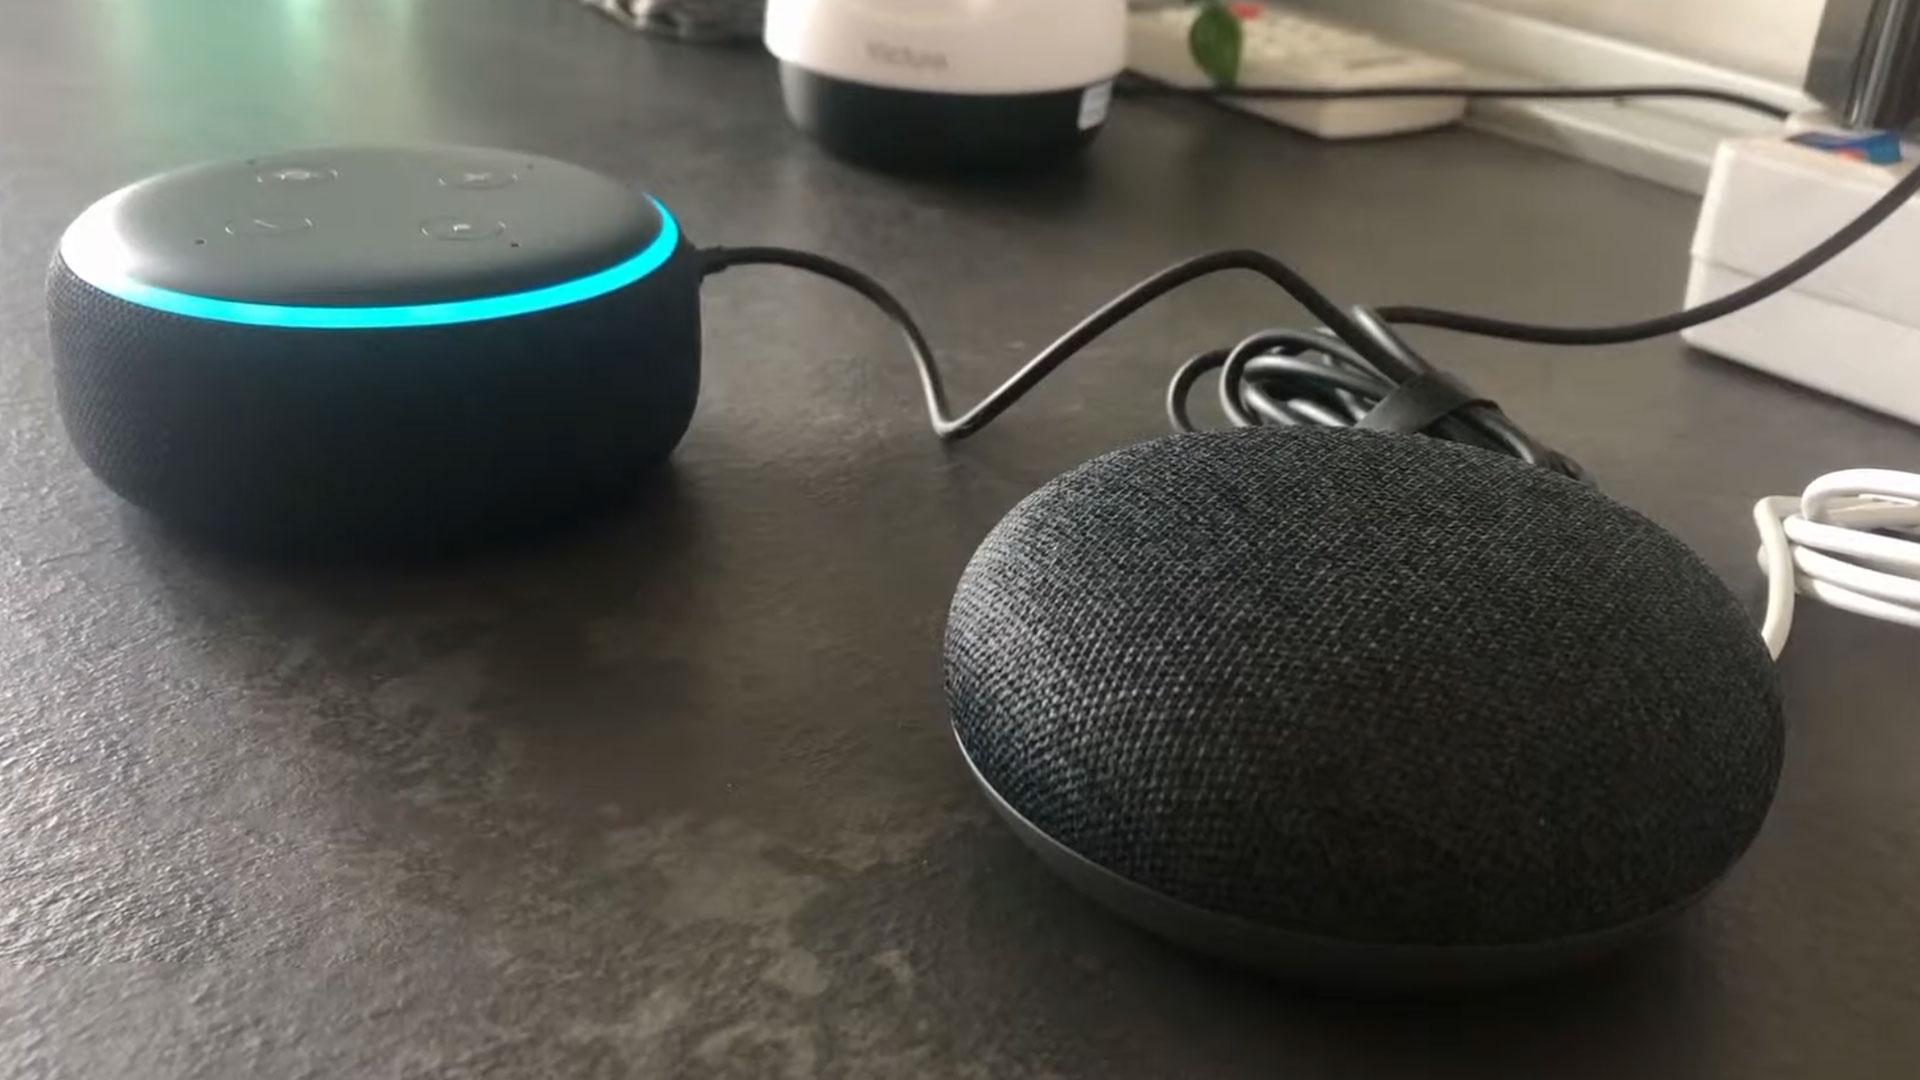 Amazon Alexa Echo Dot vs Google Home Mini having a conversation. Dialogo tra assistenti virtuali